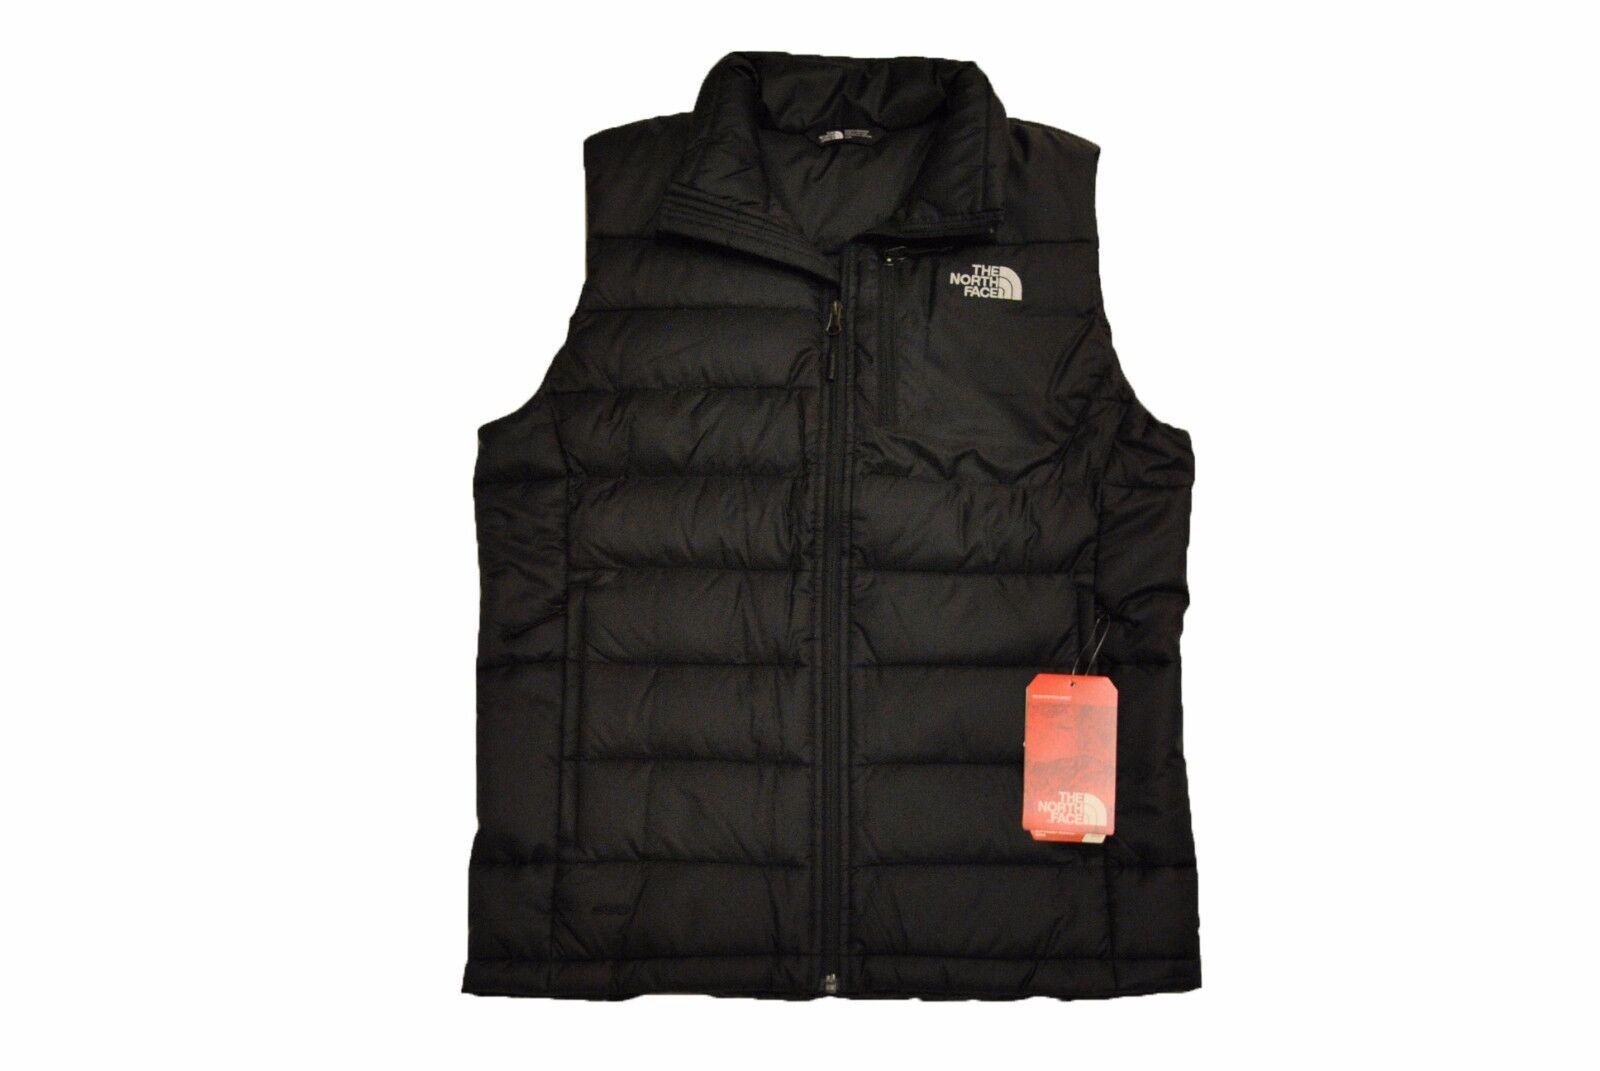 The North Face Men's Aconcagua Vest in TNF Black 550 Fill Do